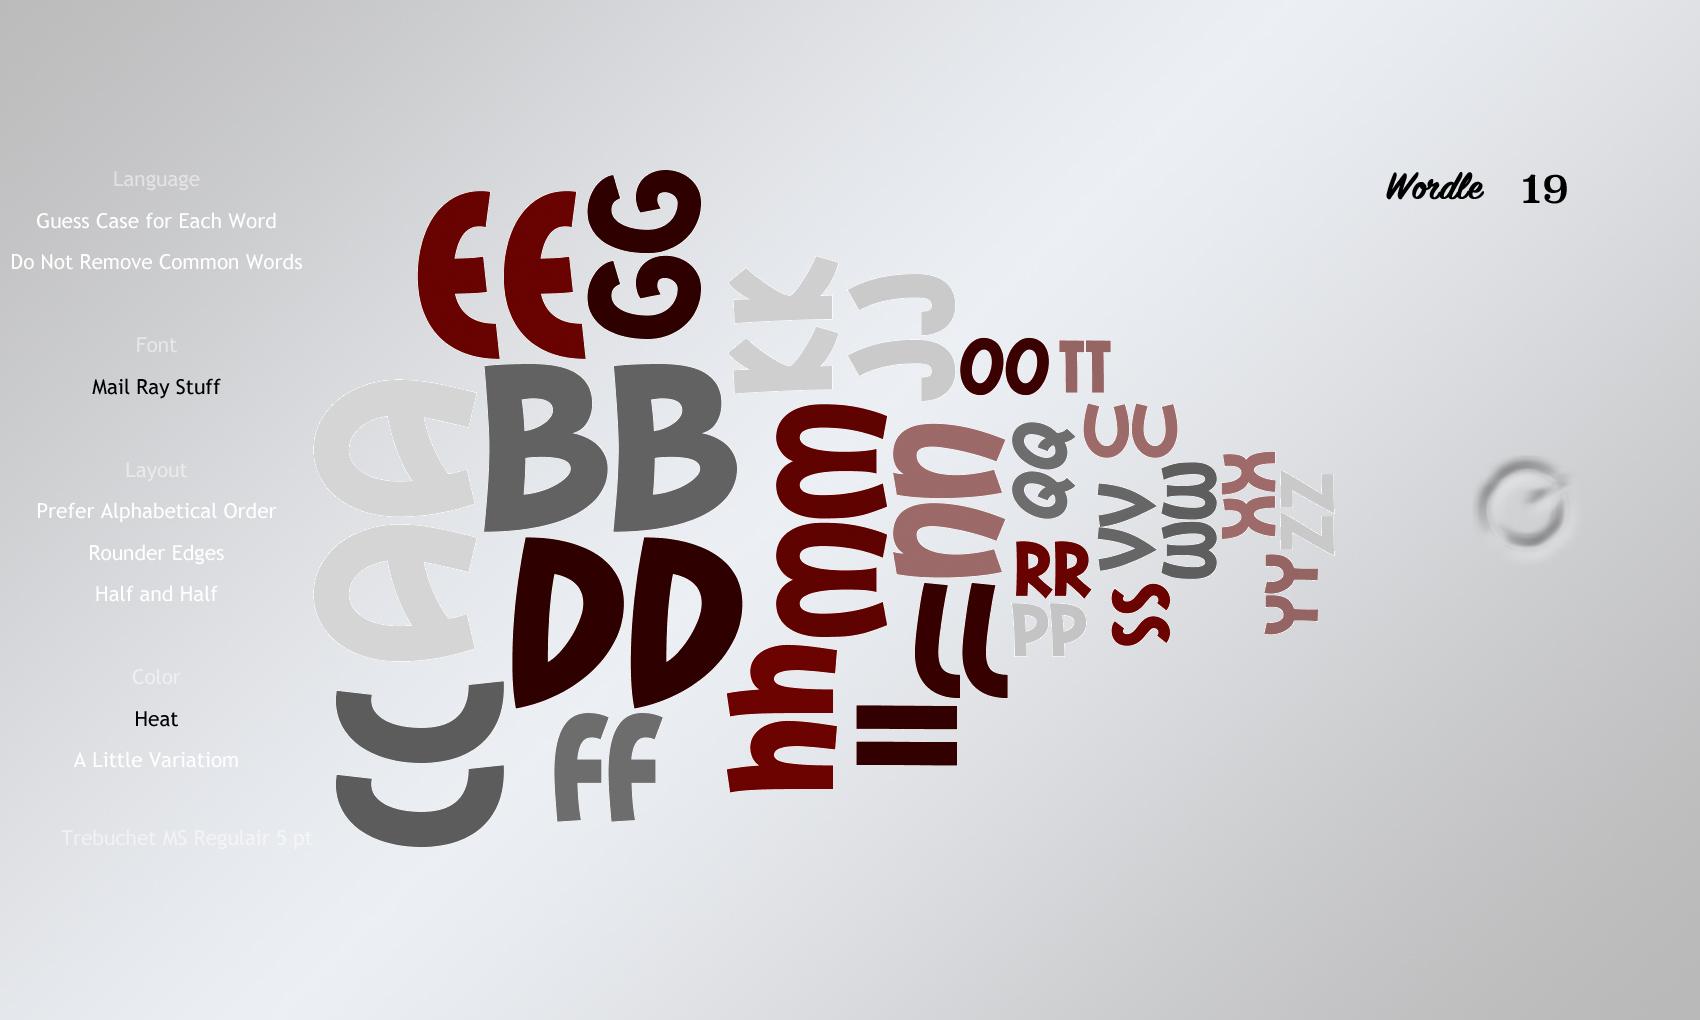 Wordle 19 Mail Ray Stuff